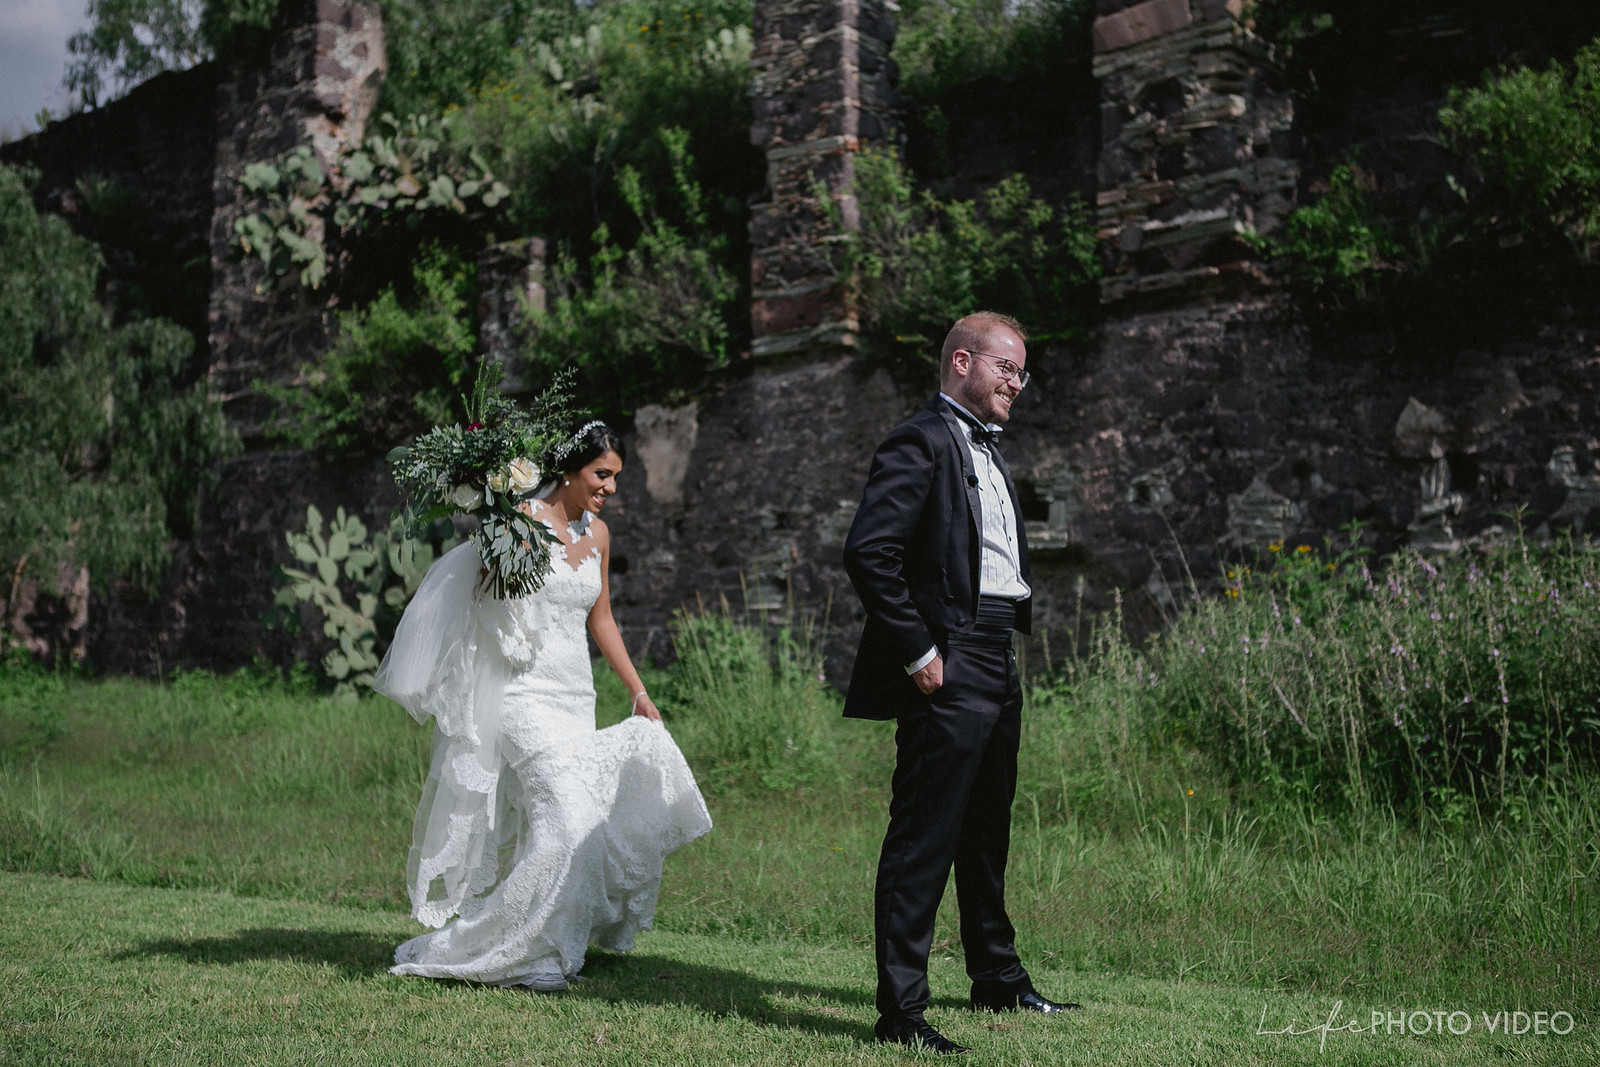 LifePhotoVideo_Boda_Guanajuato_Wedding_0017